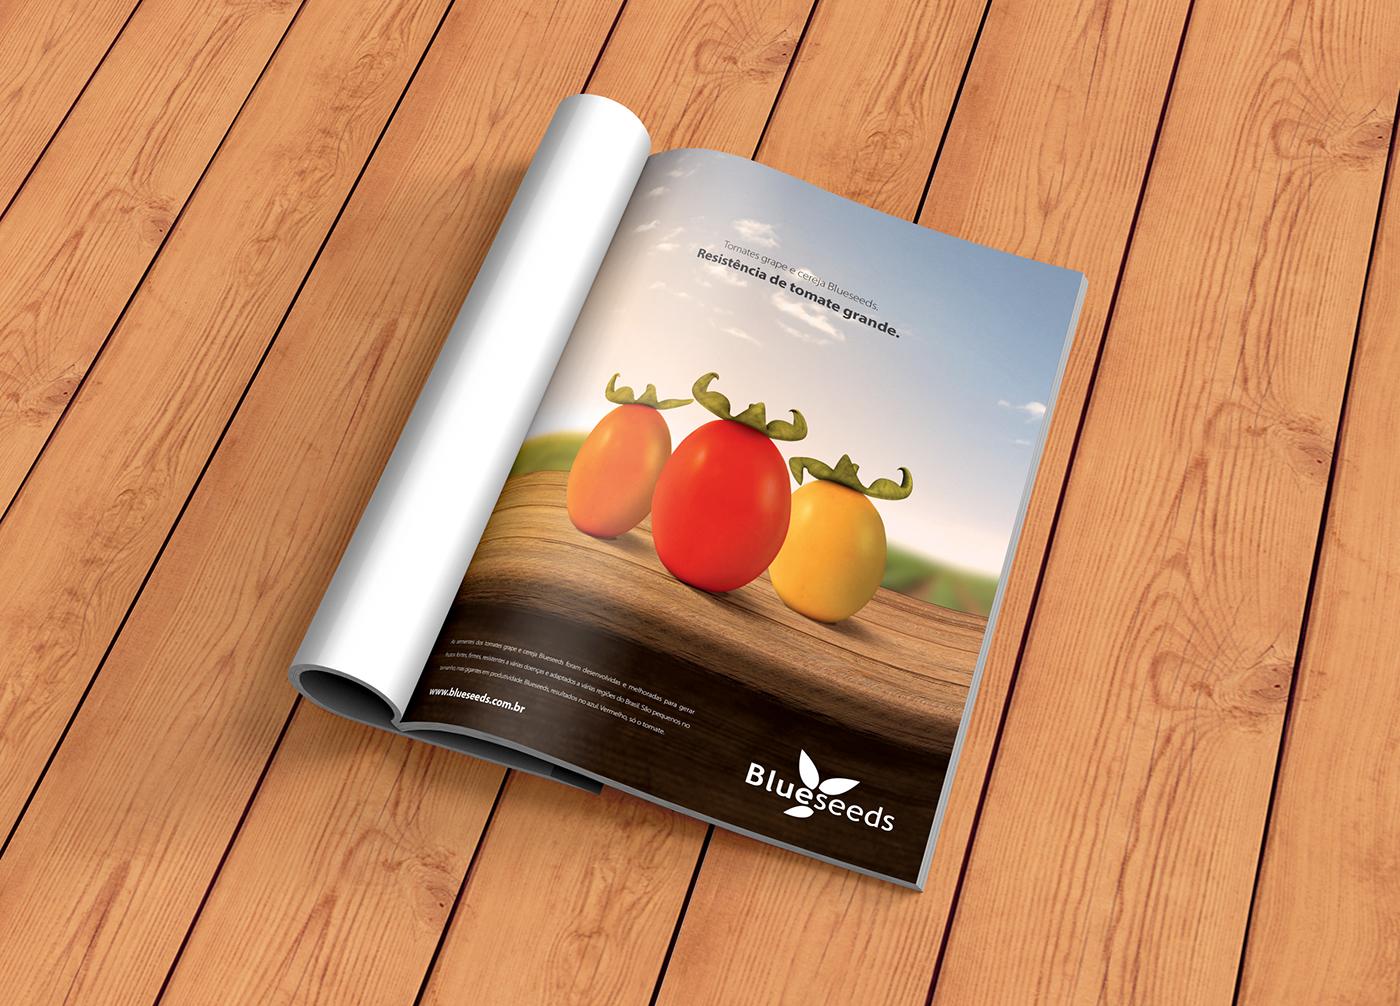 Tomato strong tomate grande FORTE Agribusiness Agro Agronegócio ad anúncio